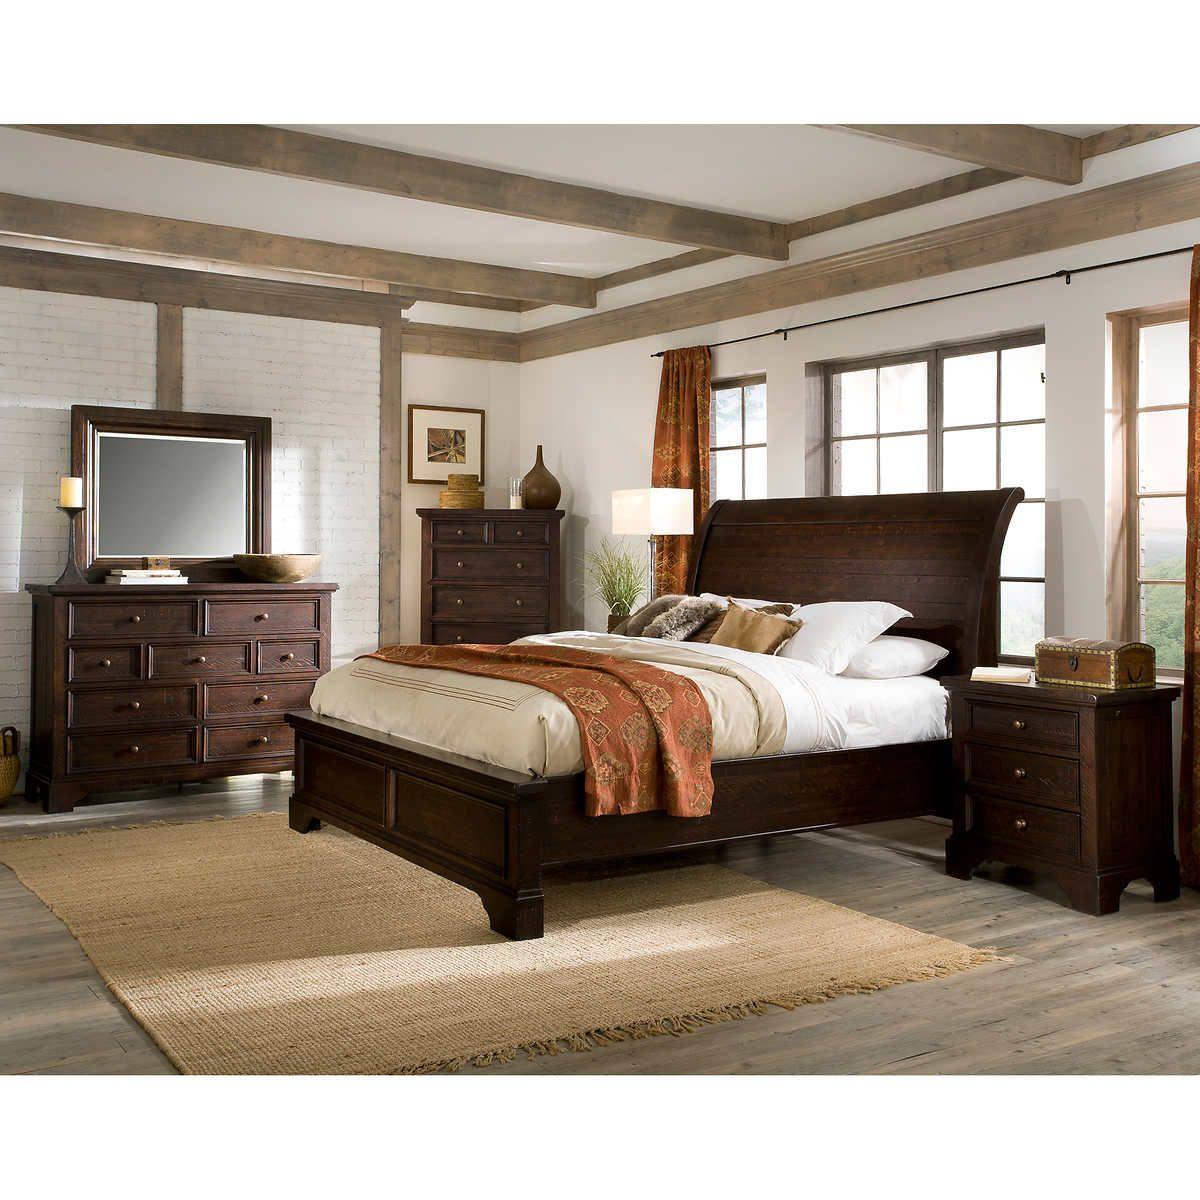 Costco Furniture Bedroom Sets - Interior Paint Color Ideas Check ...